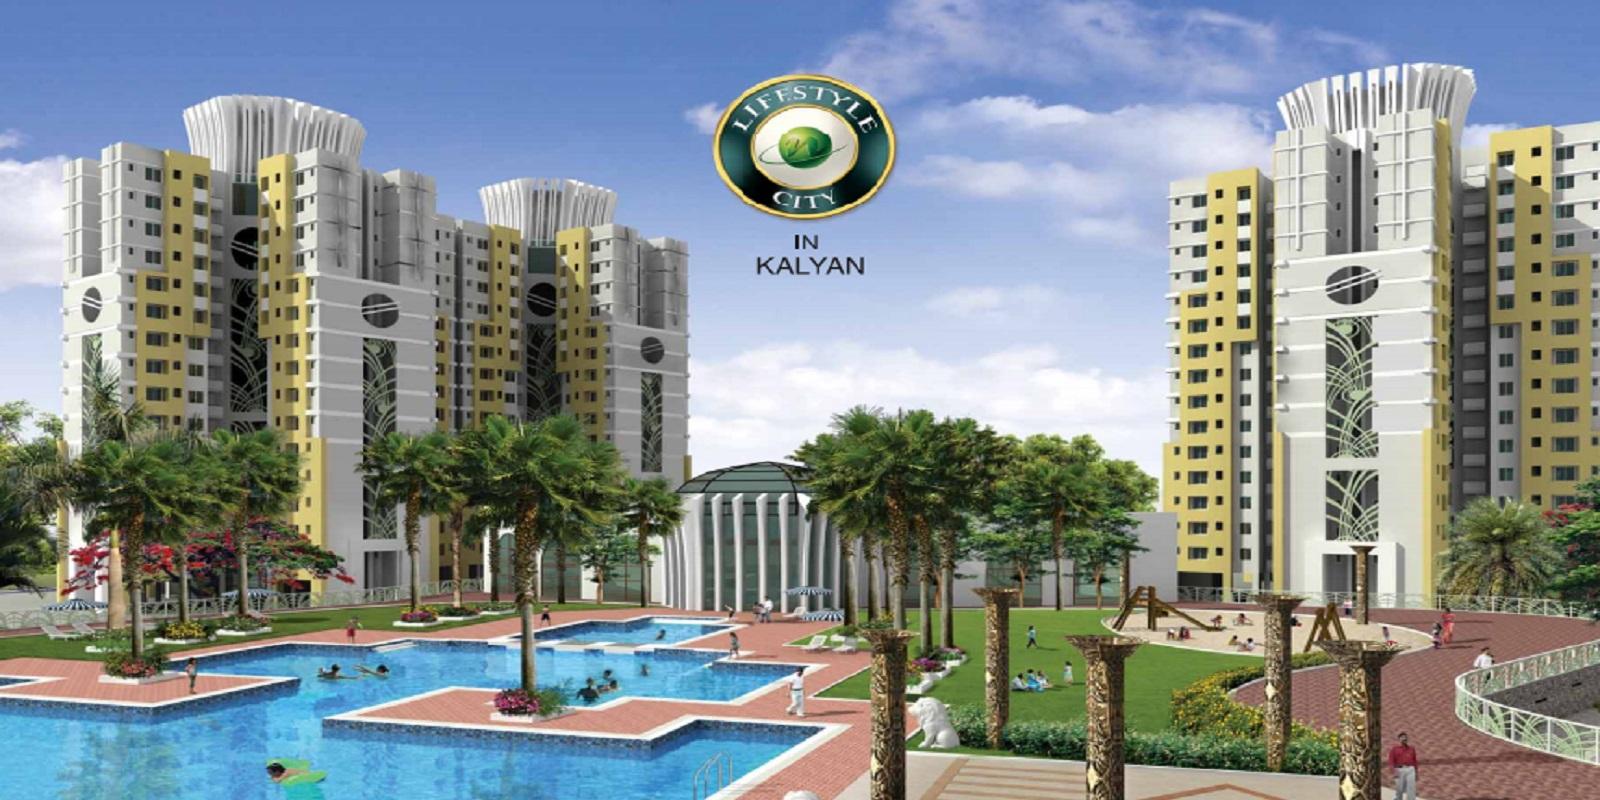 nirmal lifestyle city kalyan cypress b project project large image1